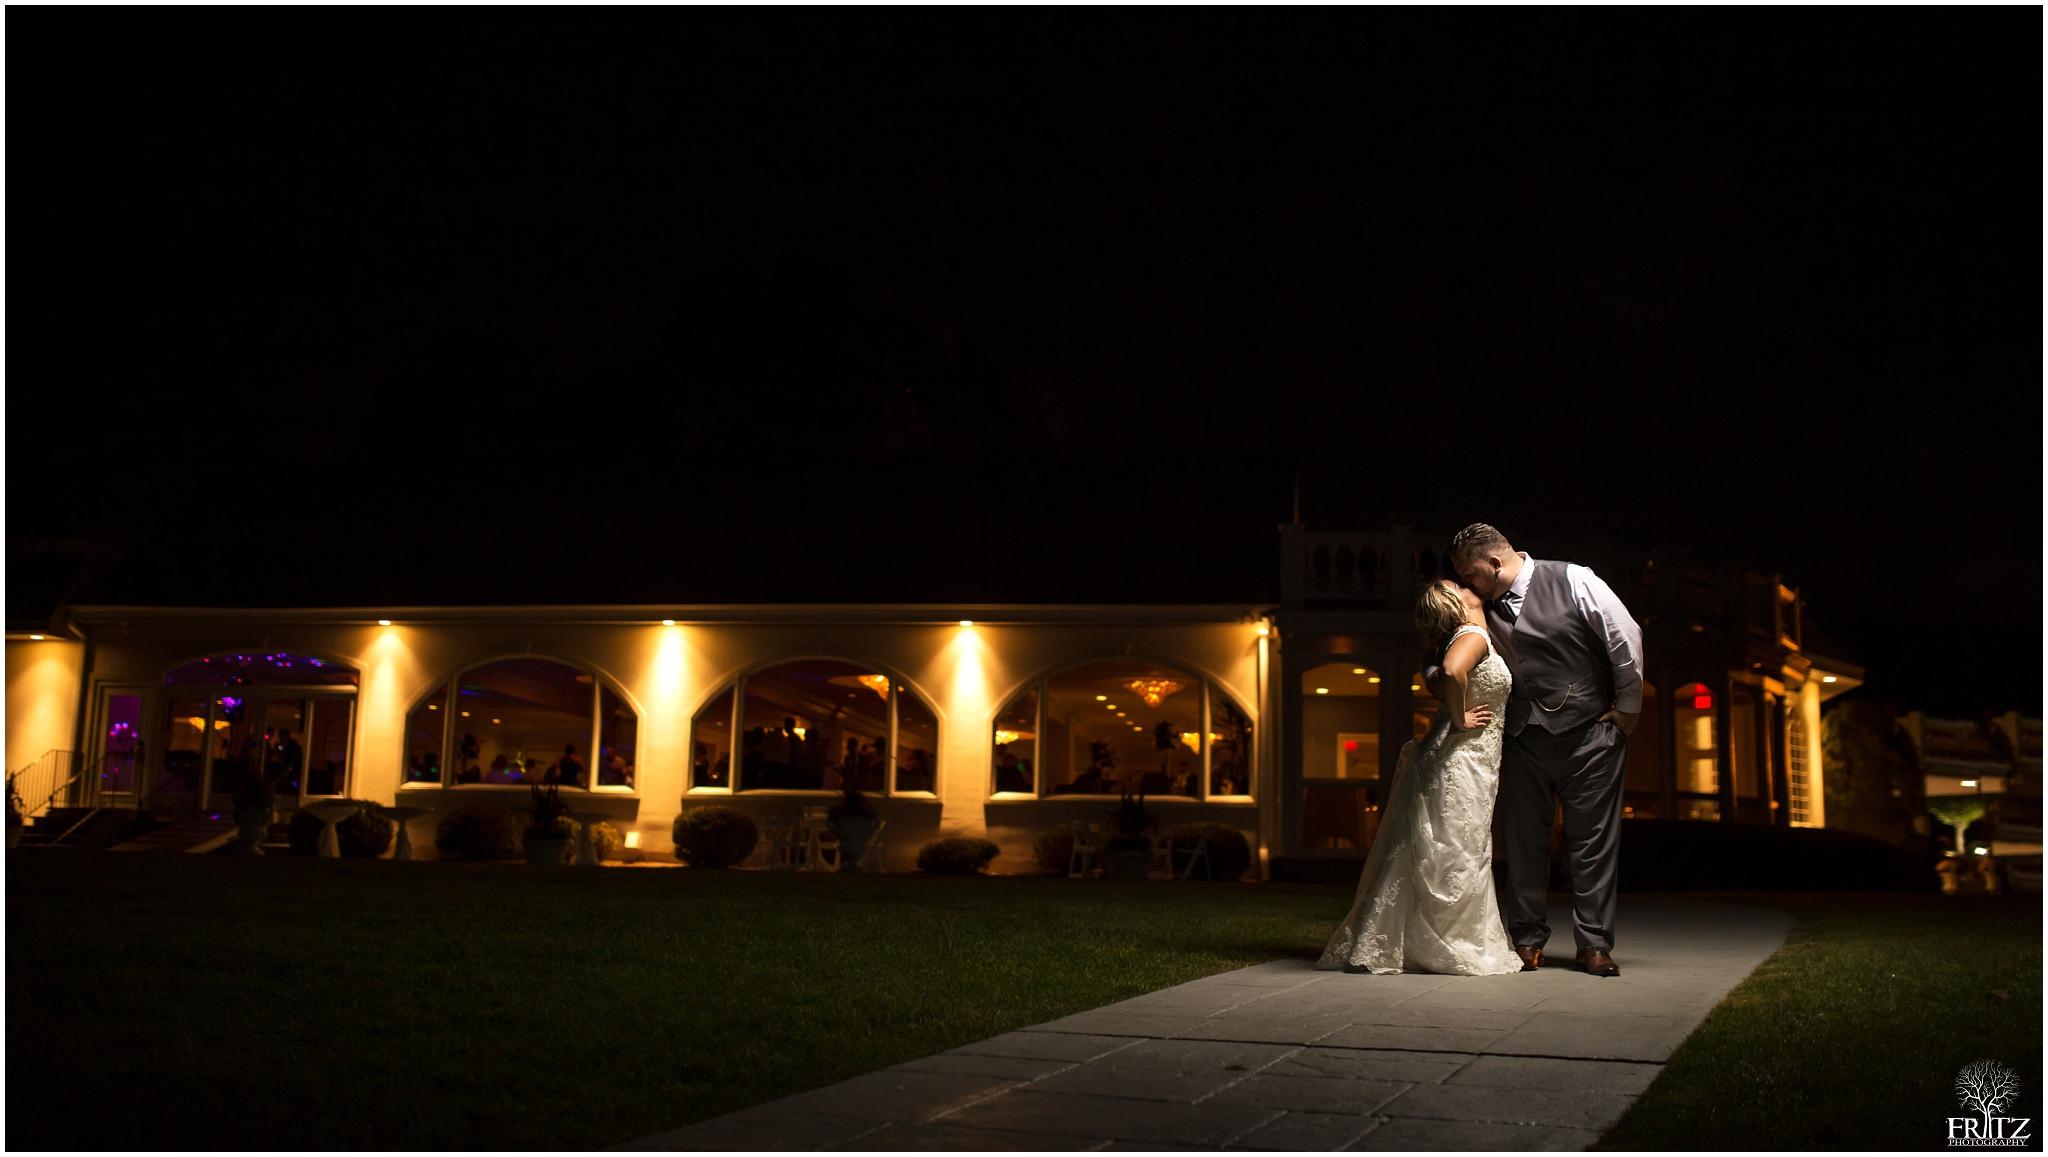 Candlewood inn wedding 17 fritz photography candlewood inn wedding 17 junglespirit Image collections